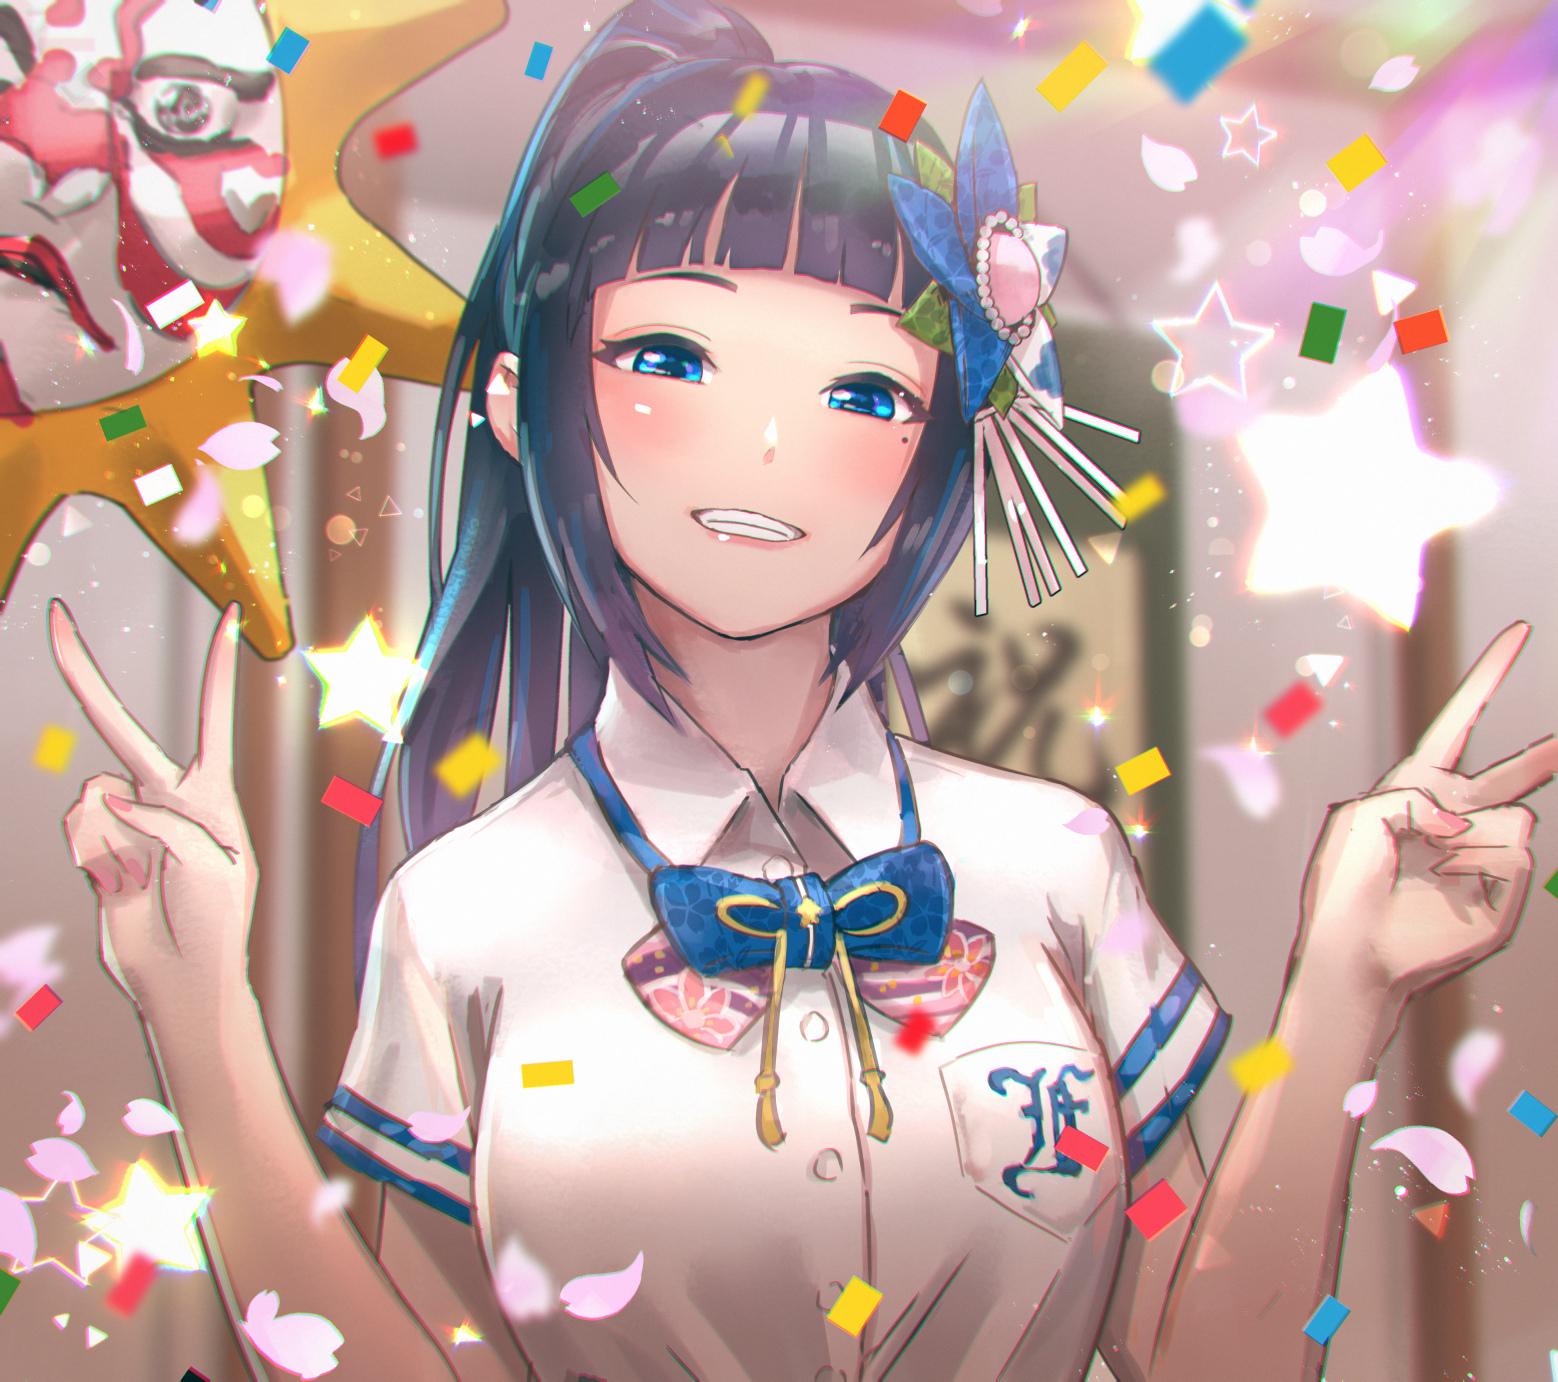 Wallpaper : anime girls, Virtual Youtuber, fan art, women, dark